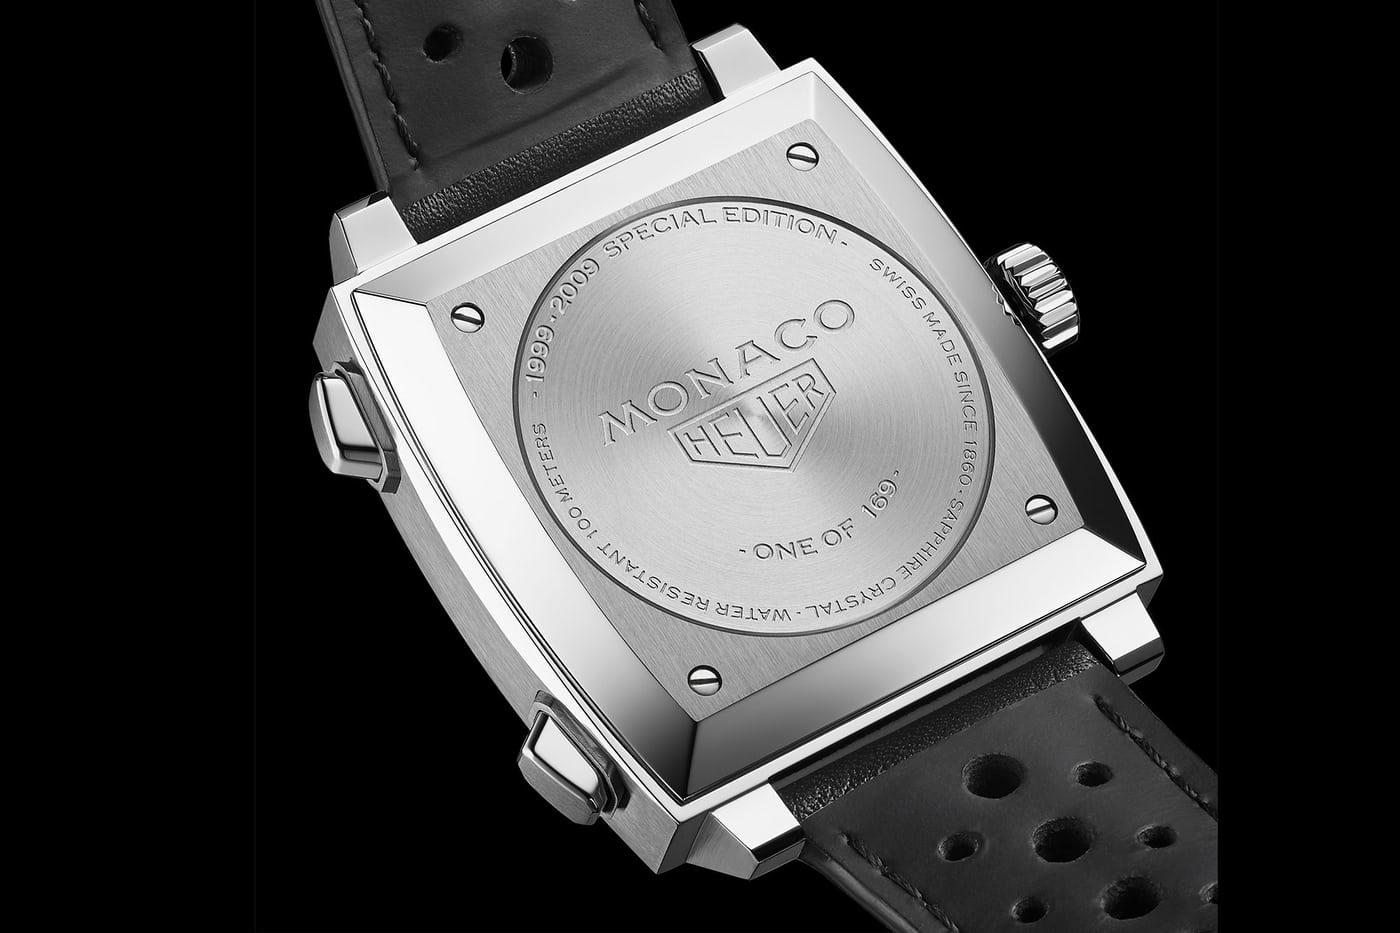 Tag Heuer horloge Monaco 4th Limited Edition 1999-2009 series - 1 van de 169 stuks